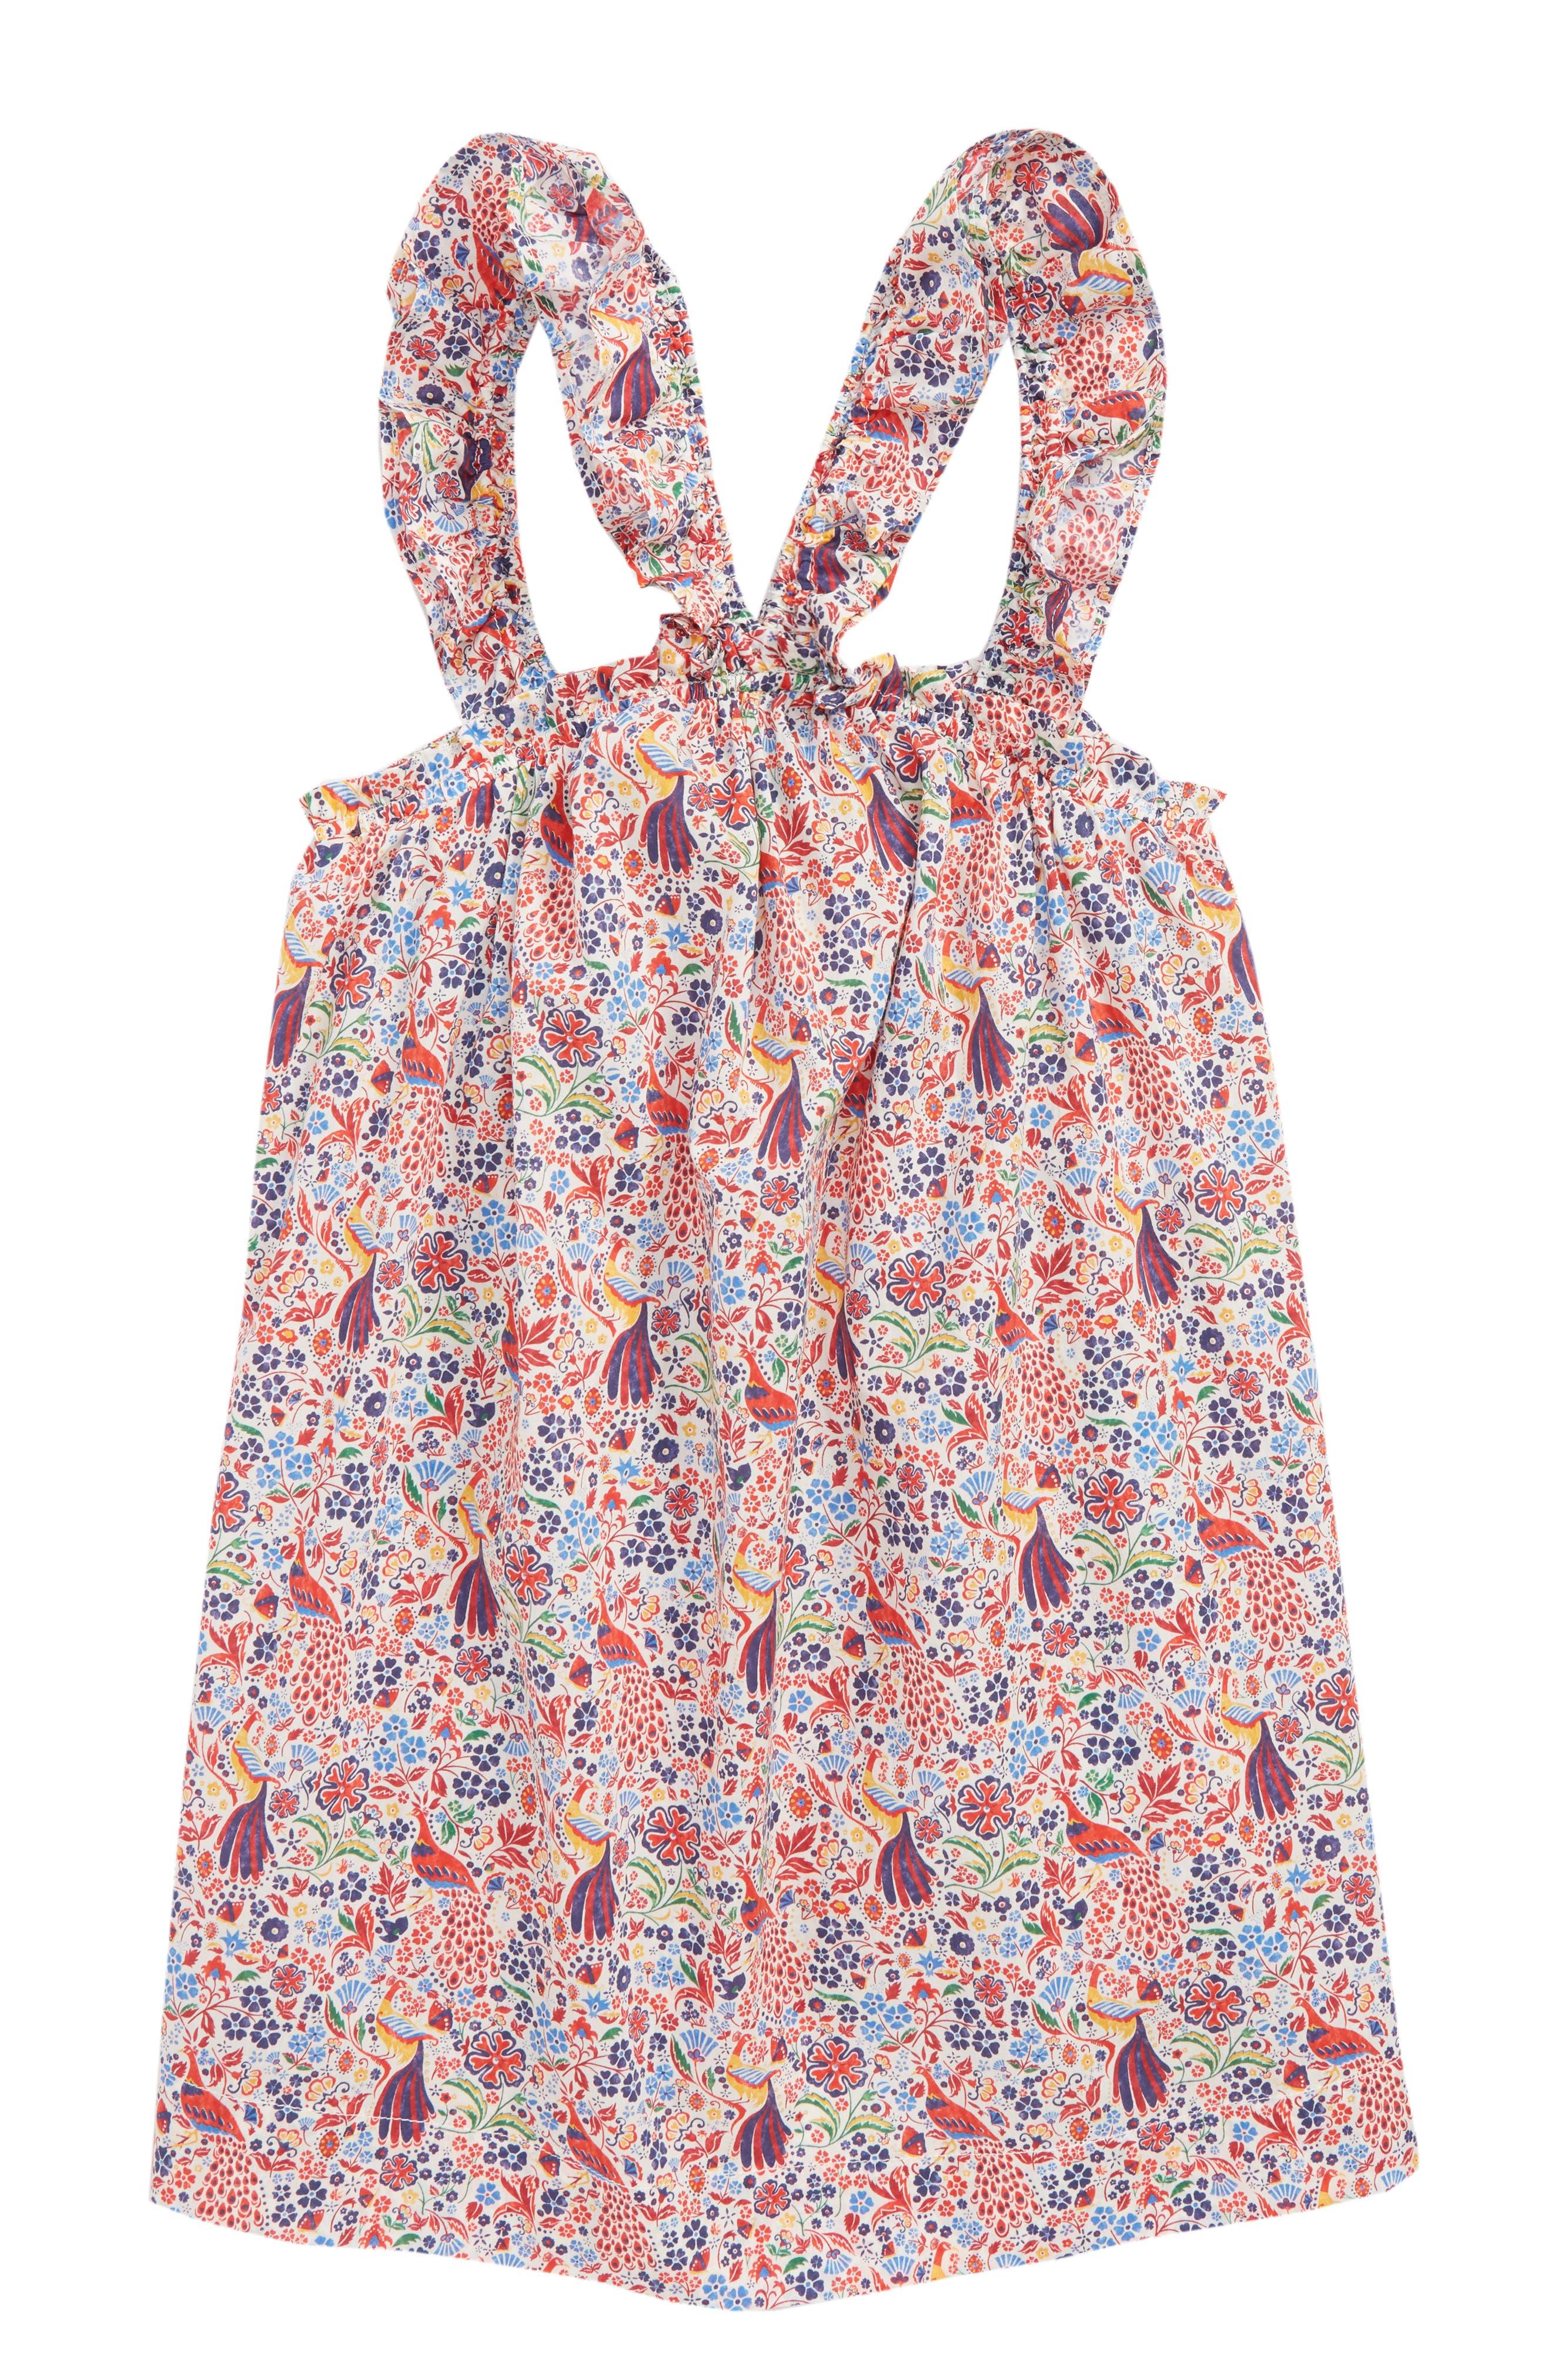 Liberty<sup>®</sup> Print Dress,                         Main,                         color, 650